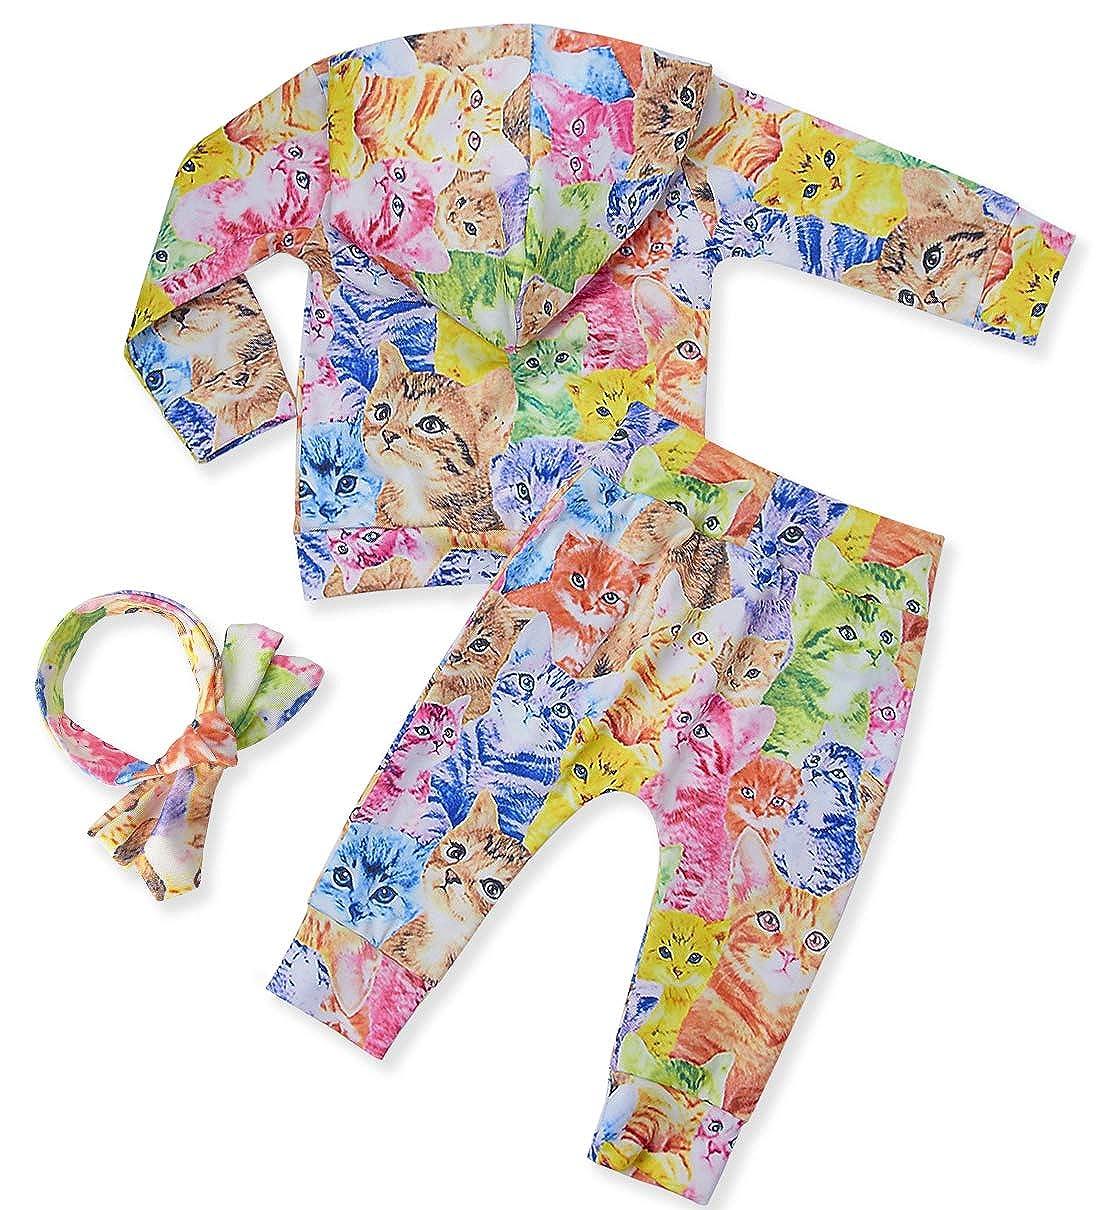 chicolife Neugeborenes Baby M/ädchen Kleidung Set Langarm Kapuzensweatshirts Outfits Unisex Trainingsanz/üge 0-24Monat